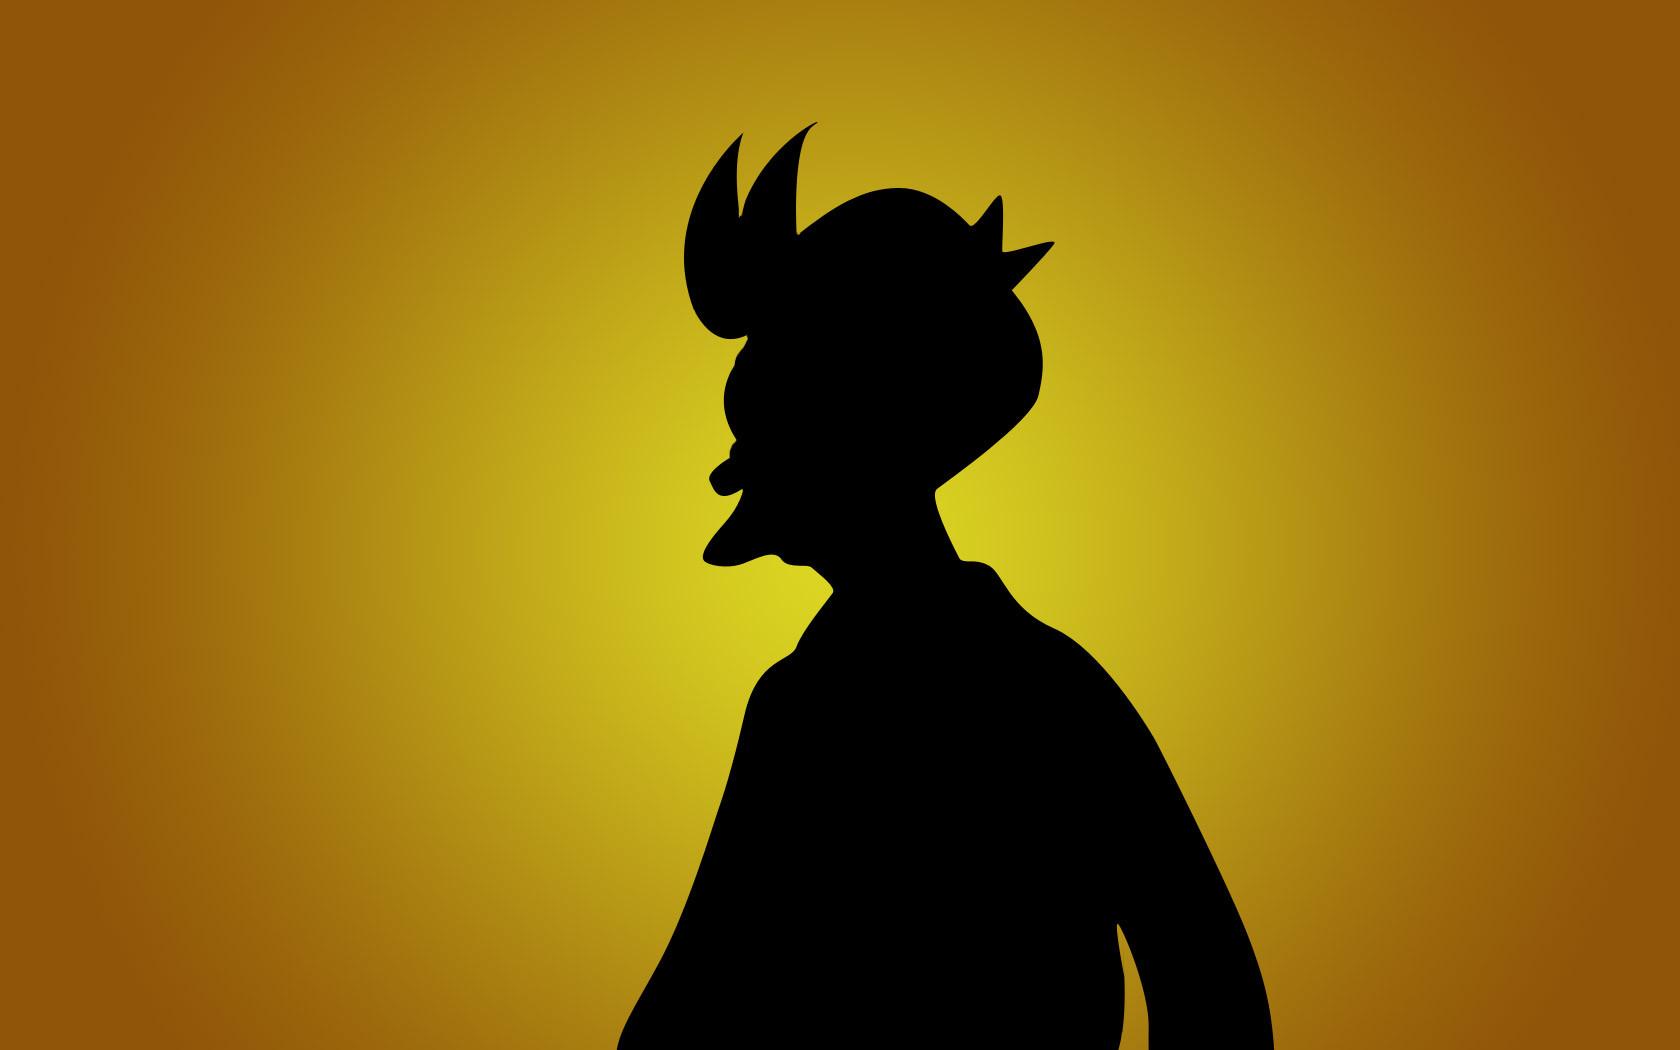 Foto de Fondos de pantalla de 'Futurama' (2/9)